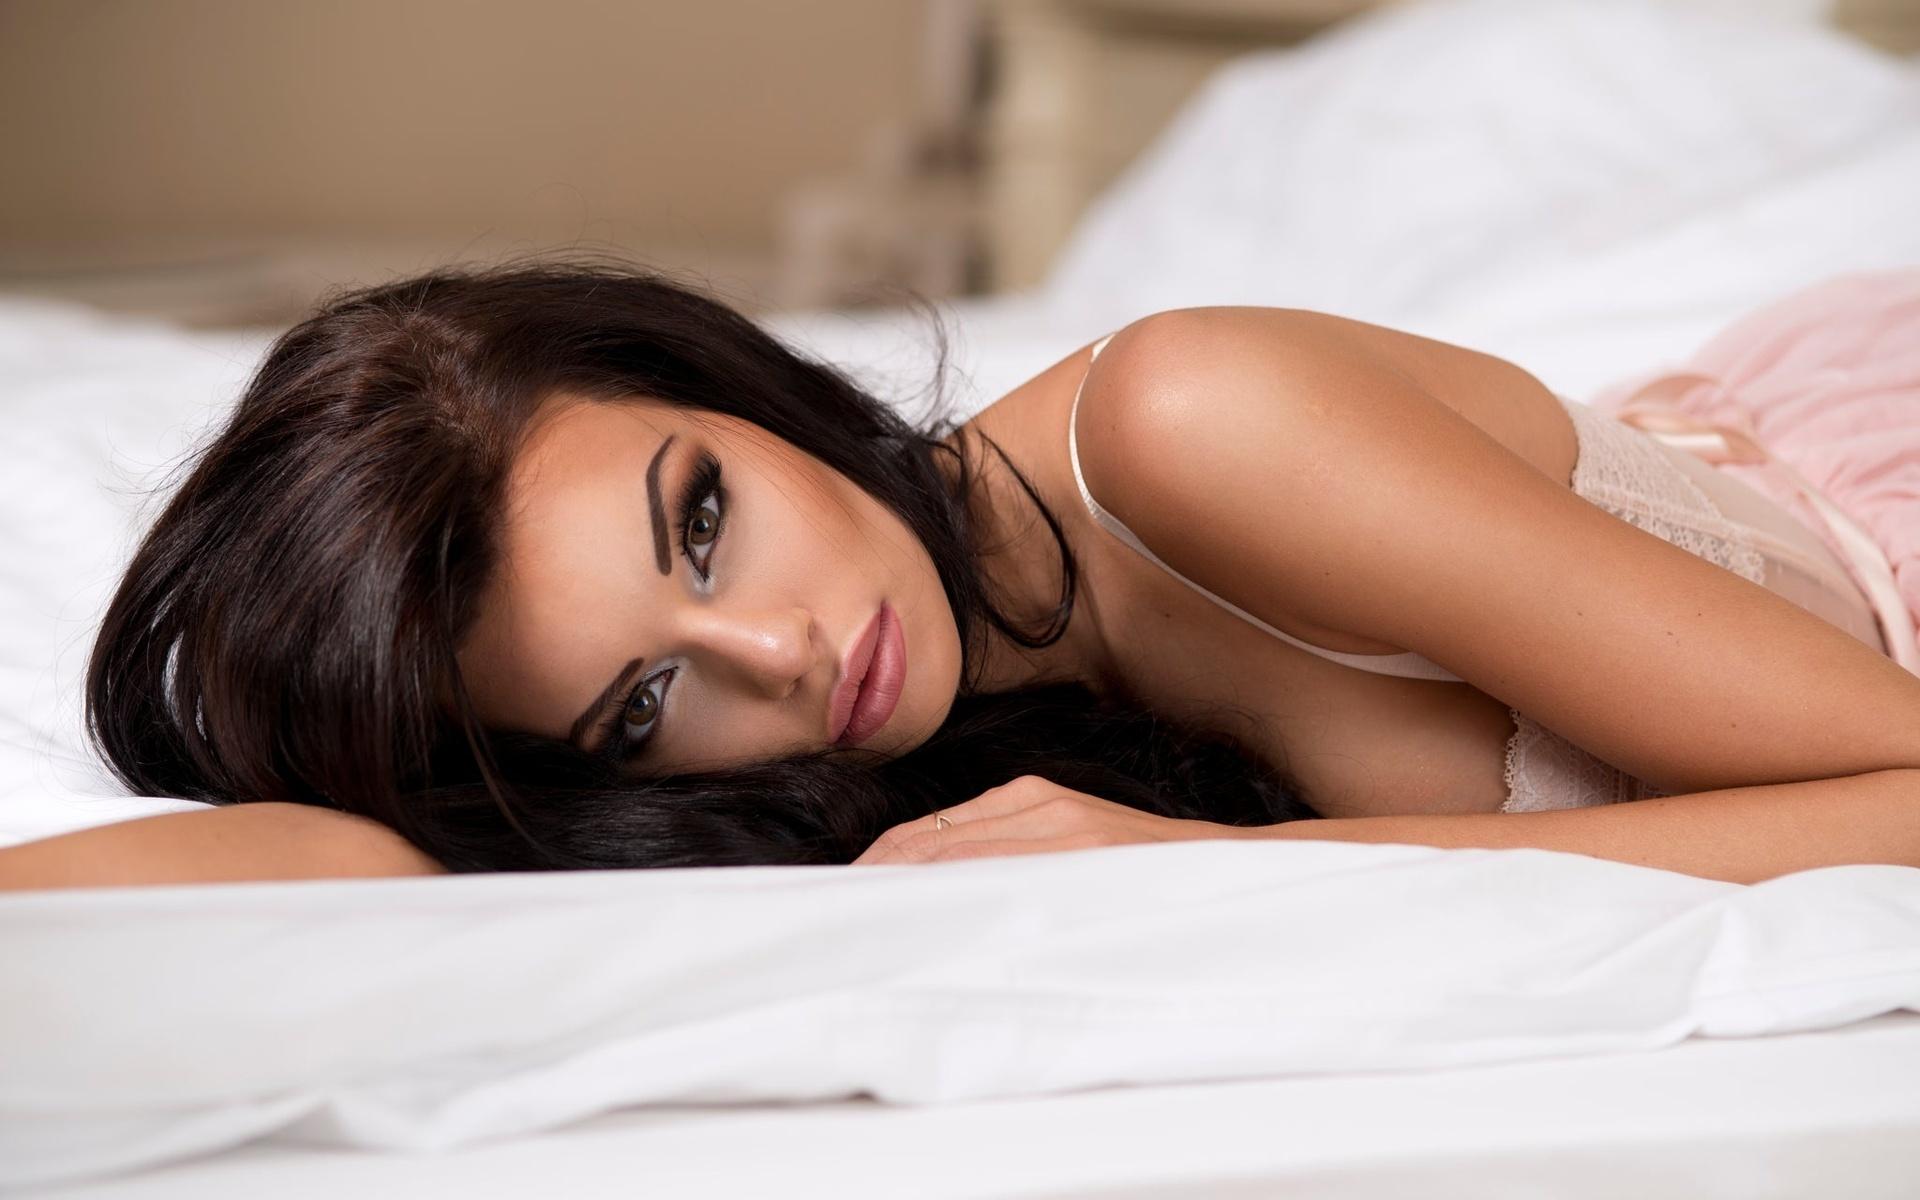 В постели с брюнеткой — pic 13